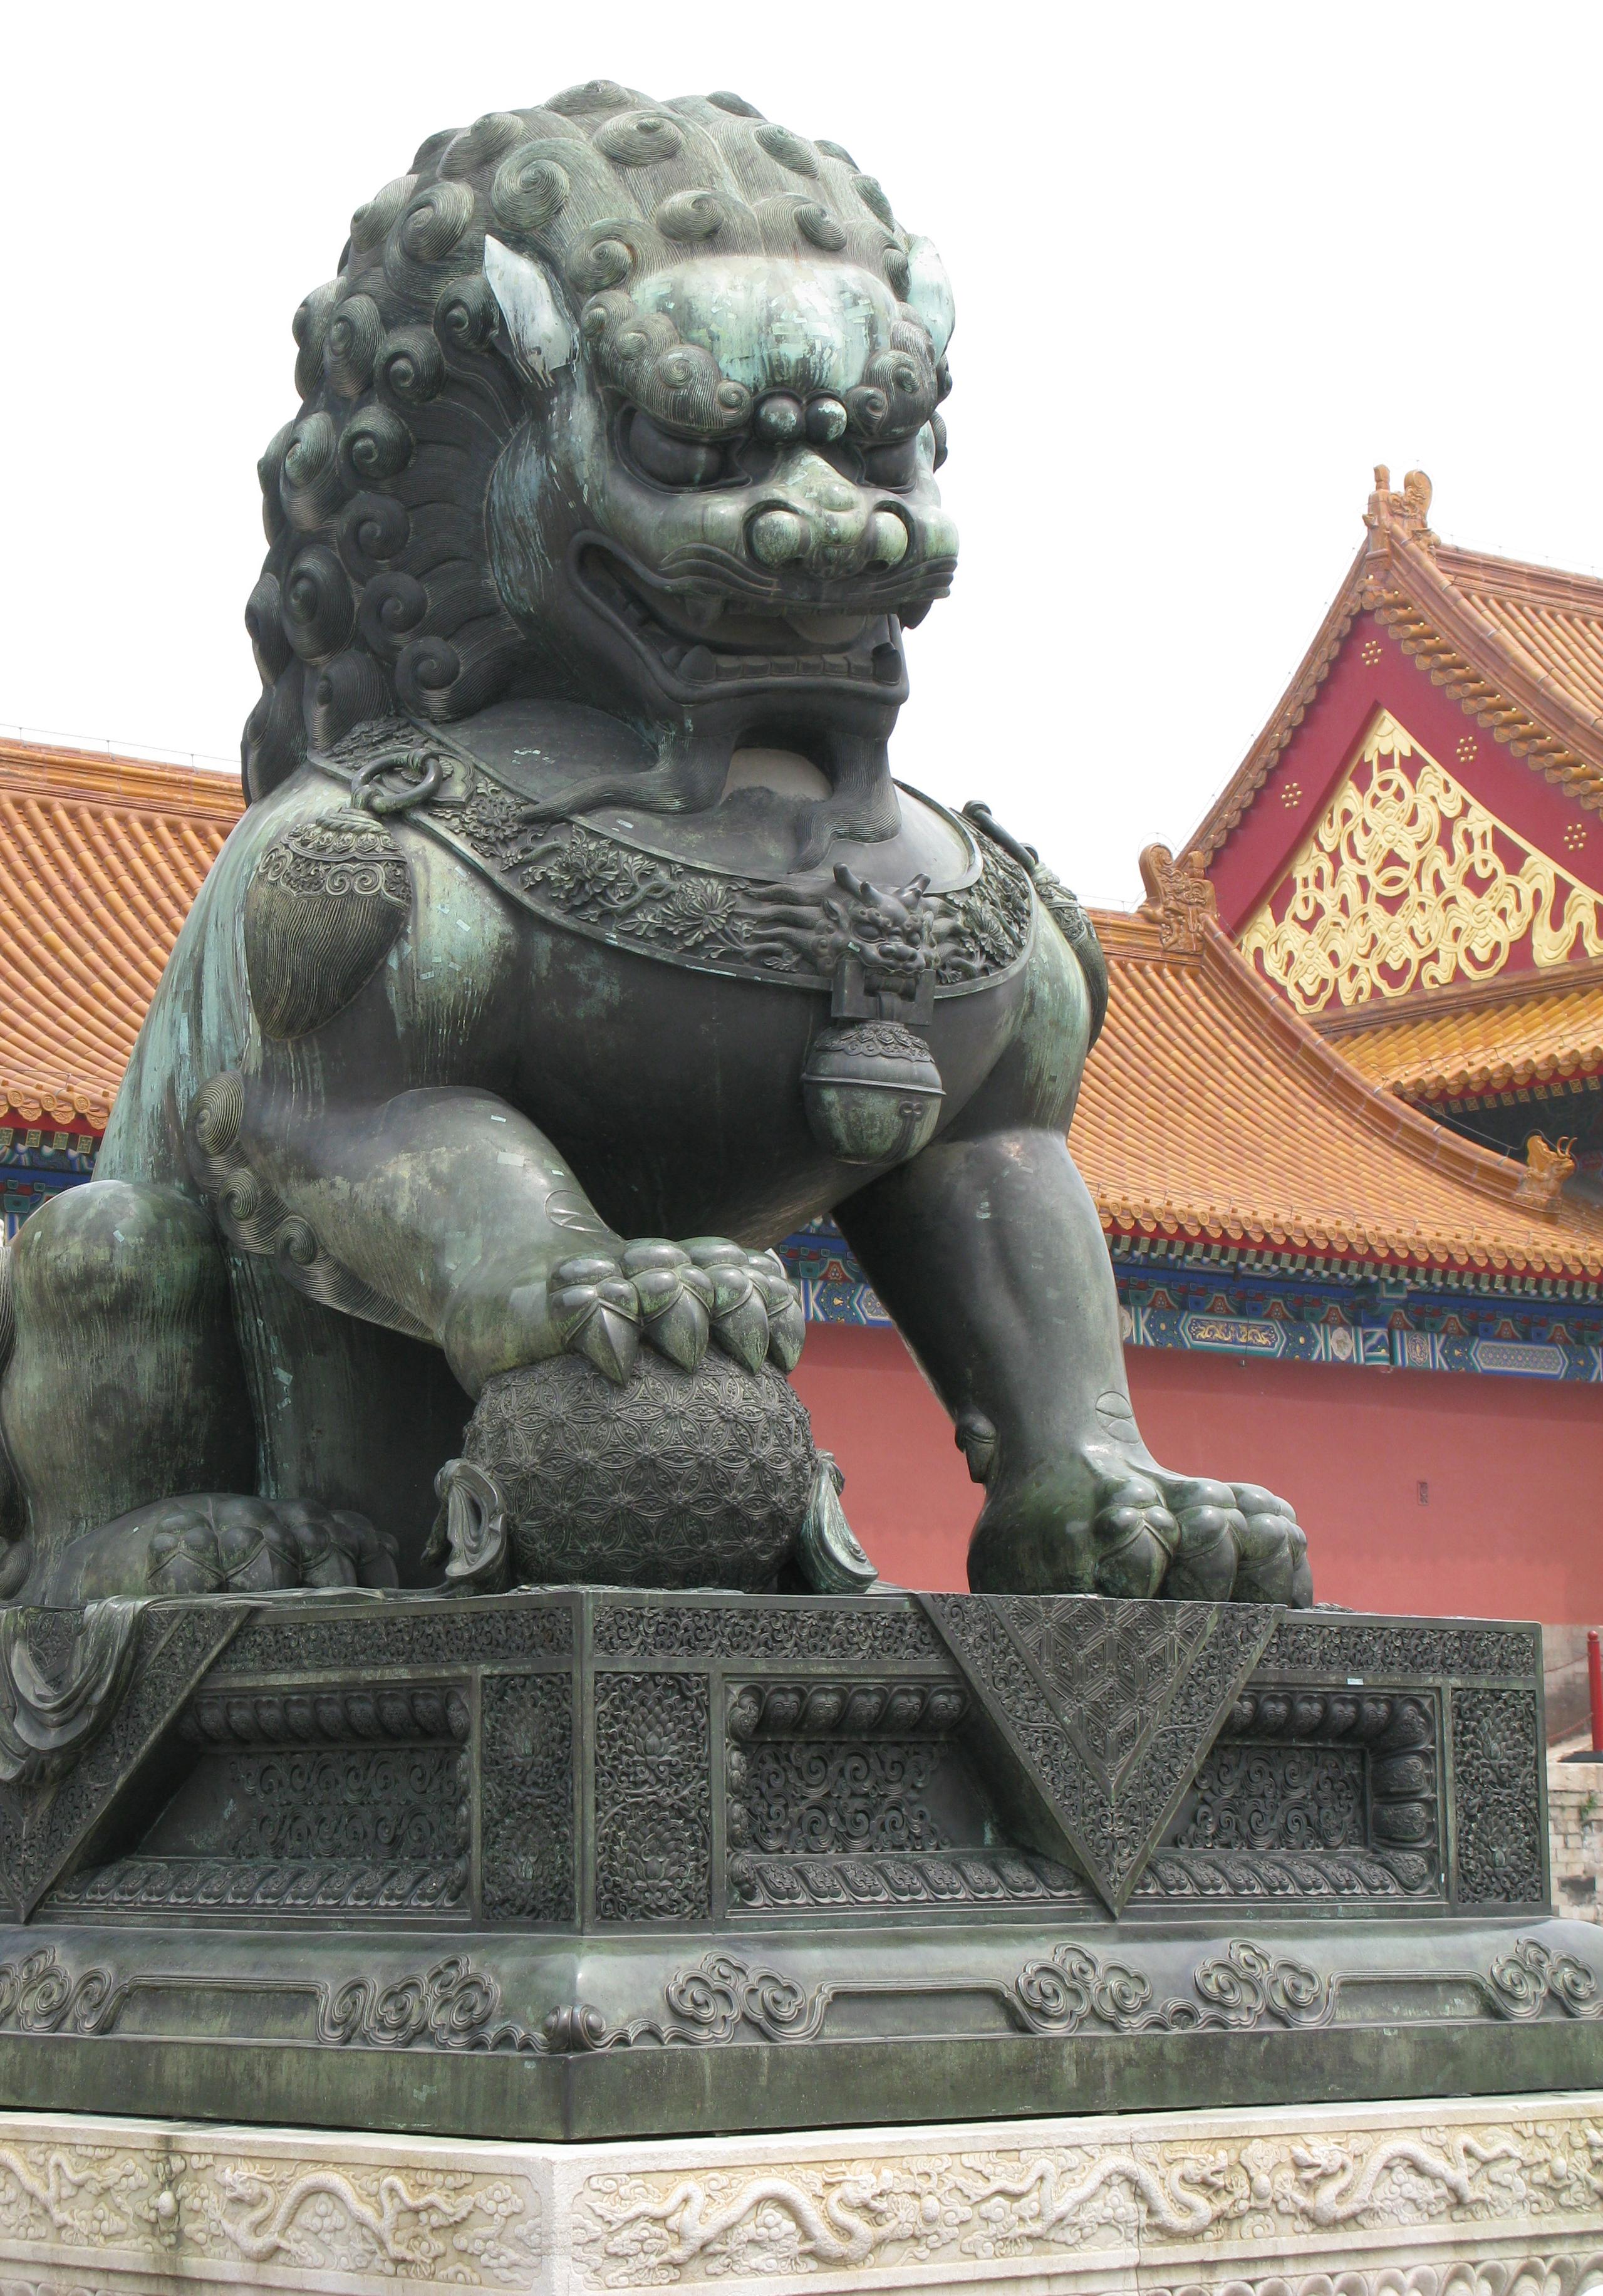 A lion, a leg on a globe, symbol of power